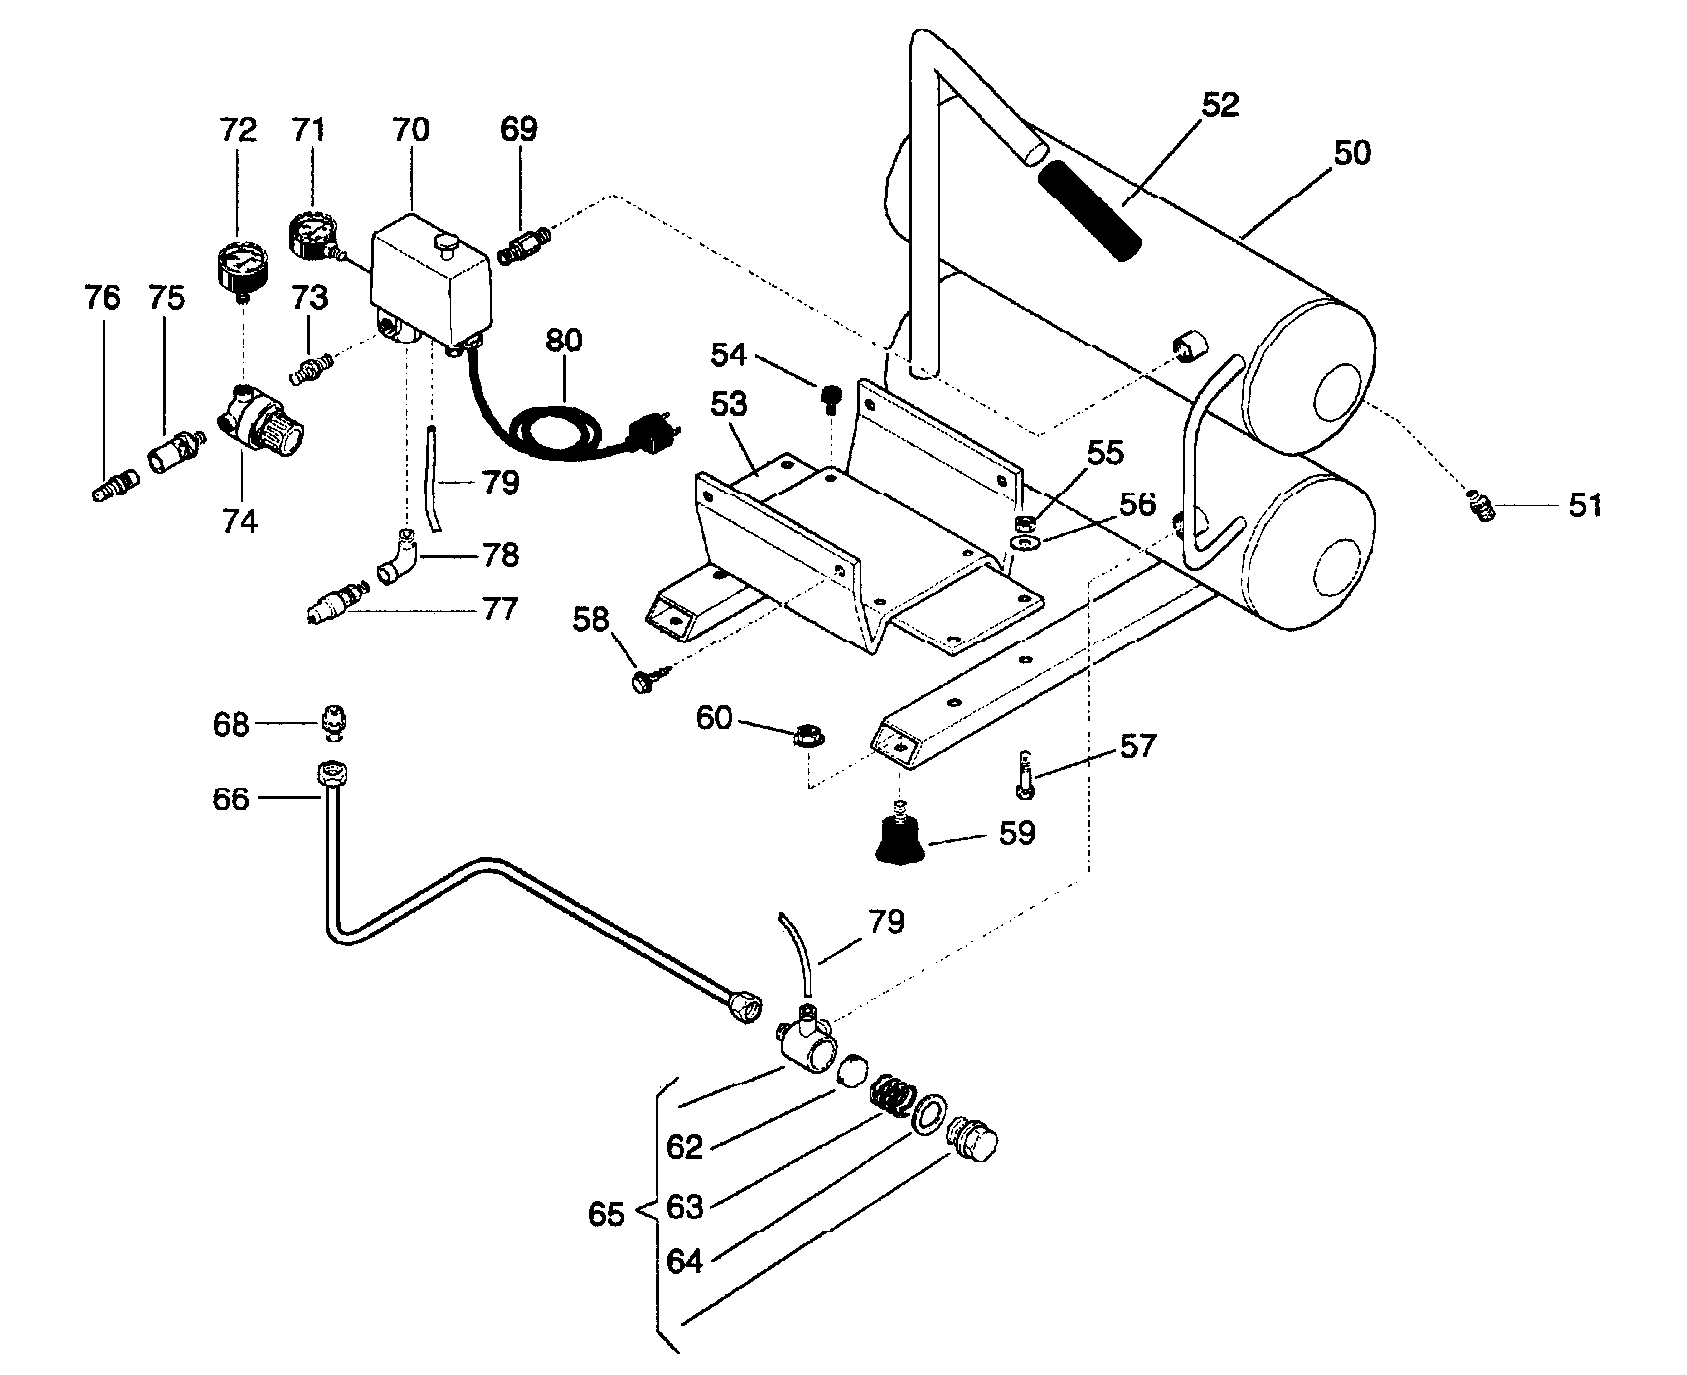 Ingersoll-Rand model DD2T2 air compressor genuine parts